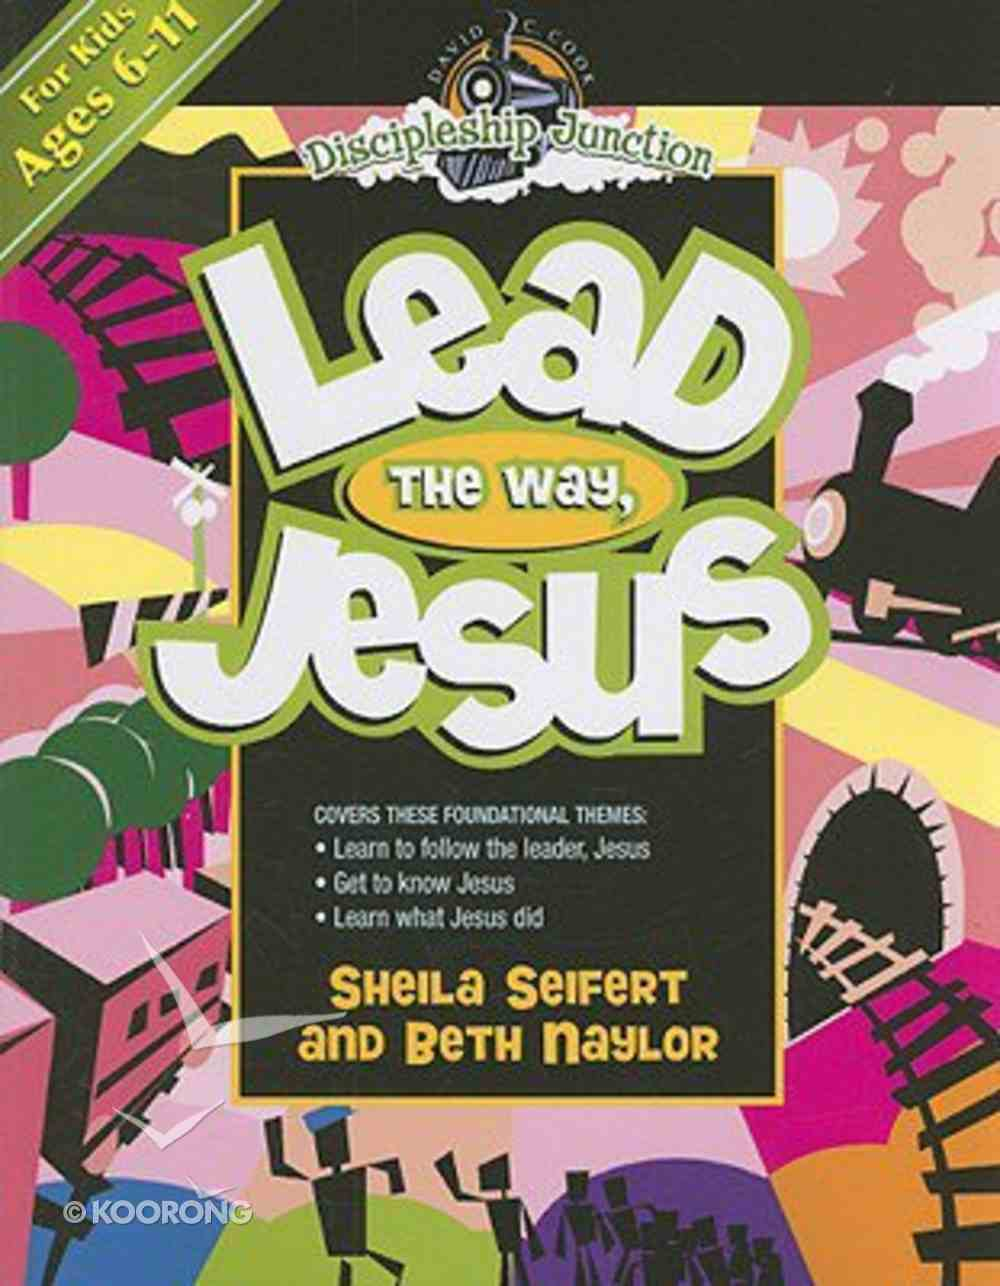 Lead the Way, Jesus (Discipleship Junction Series) Paperback